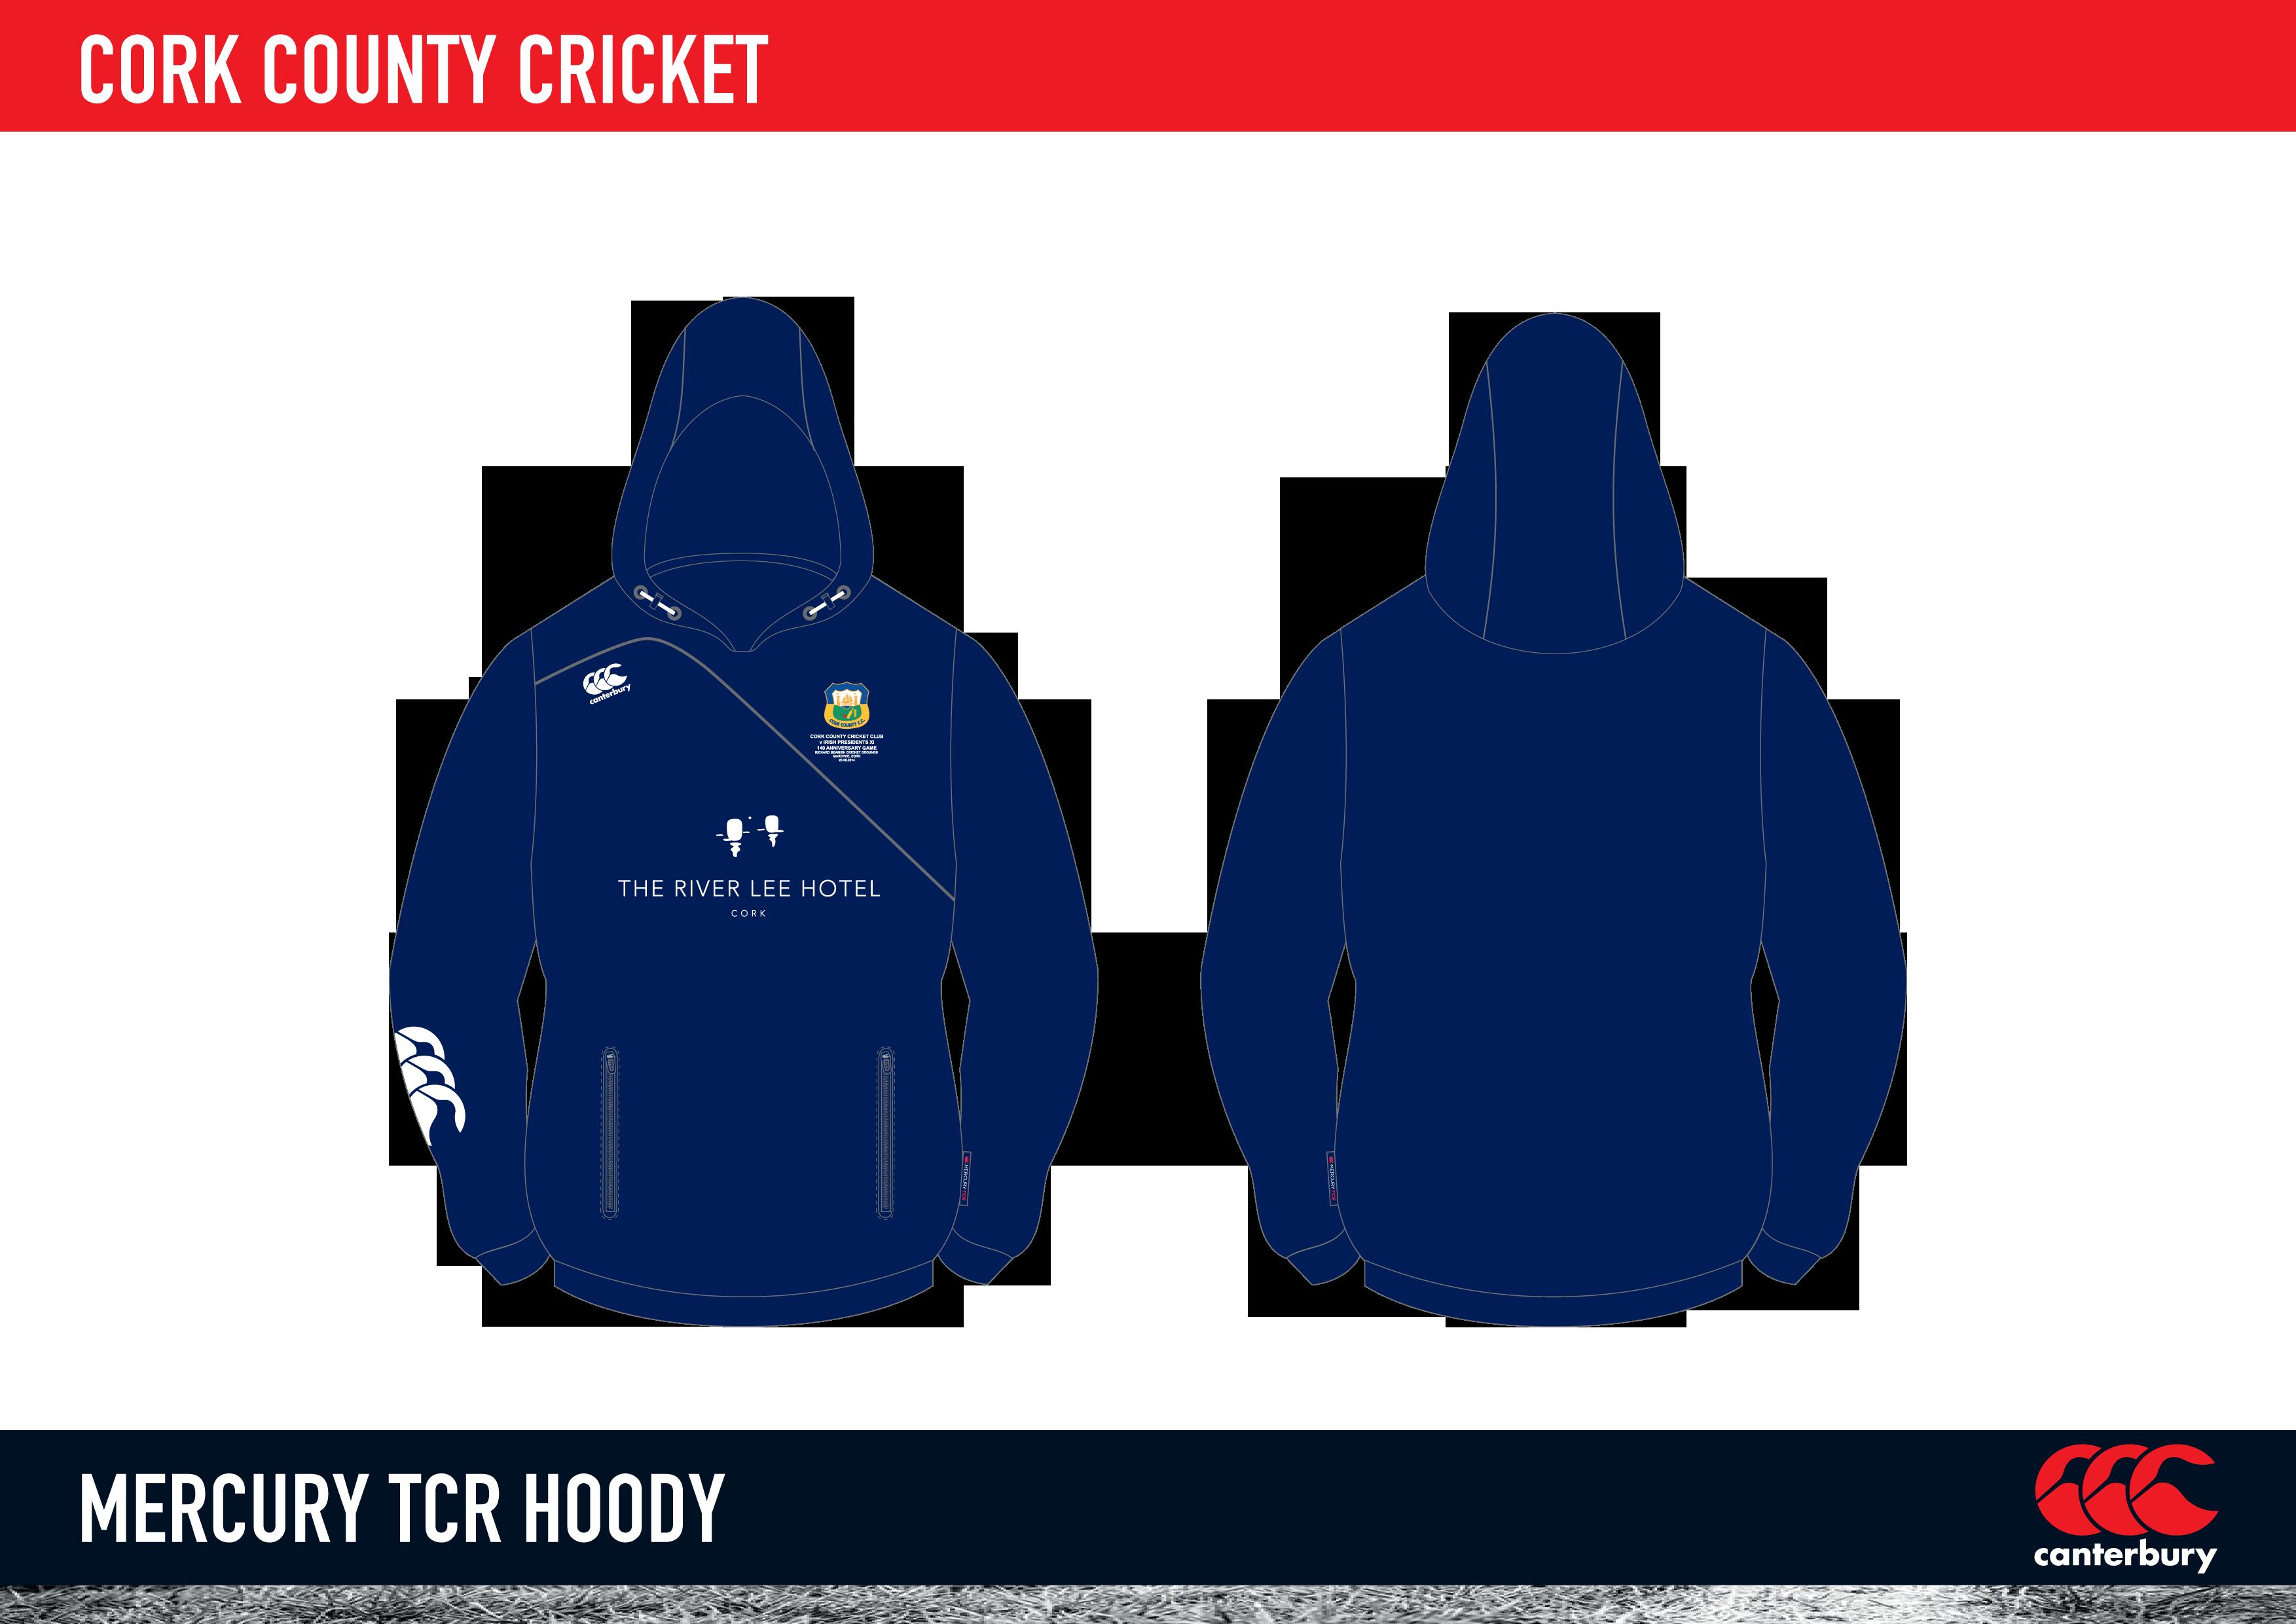 cork county cricket mercury tcr hoody 2015 « cork county cricket club